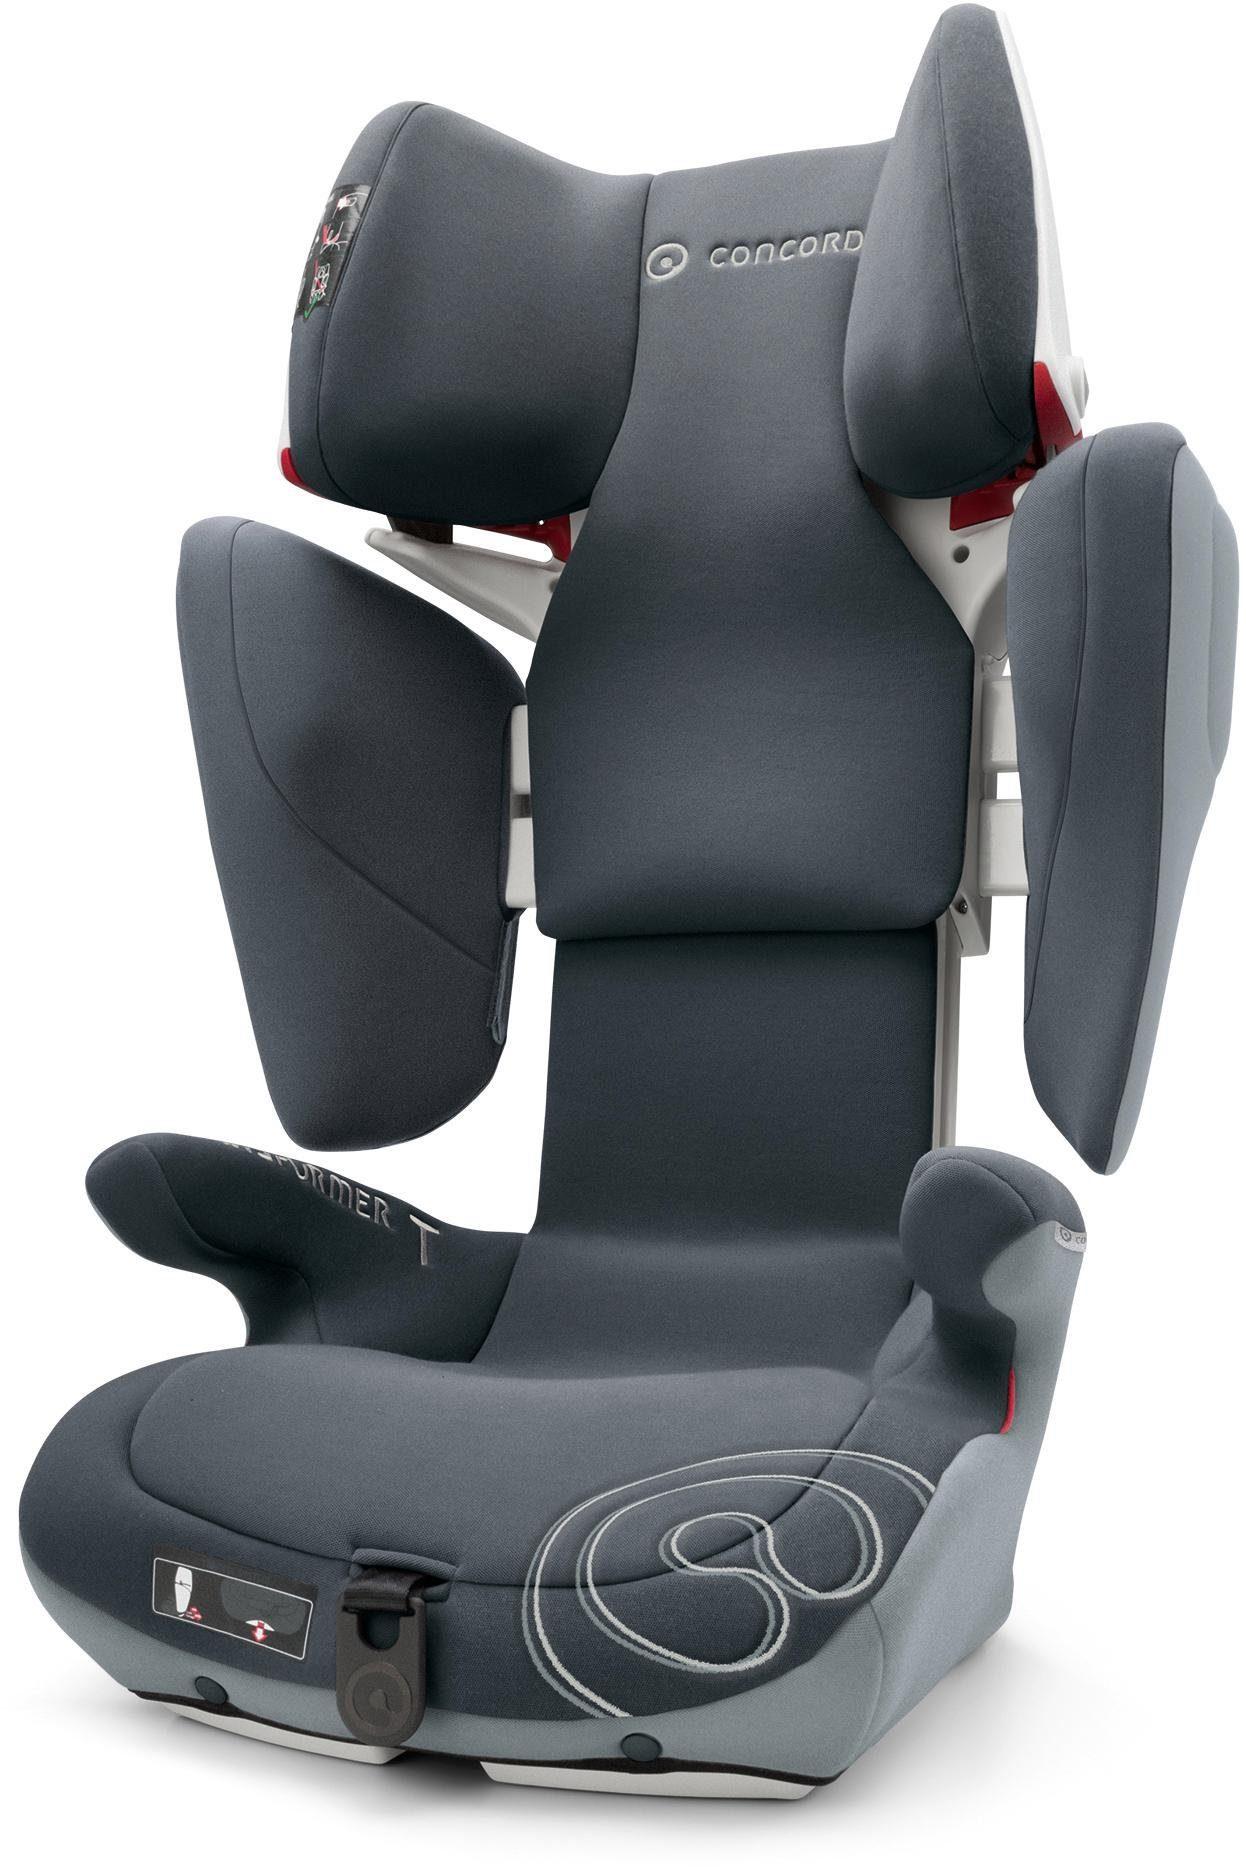 Concord Kindersitz, 15-36 kg, »Transformer T, Graphite Grey«